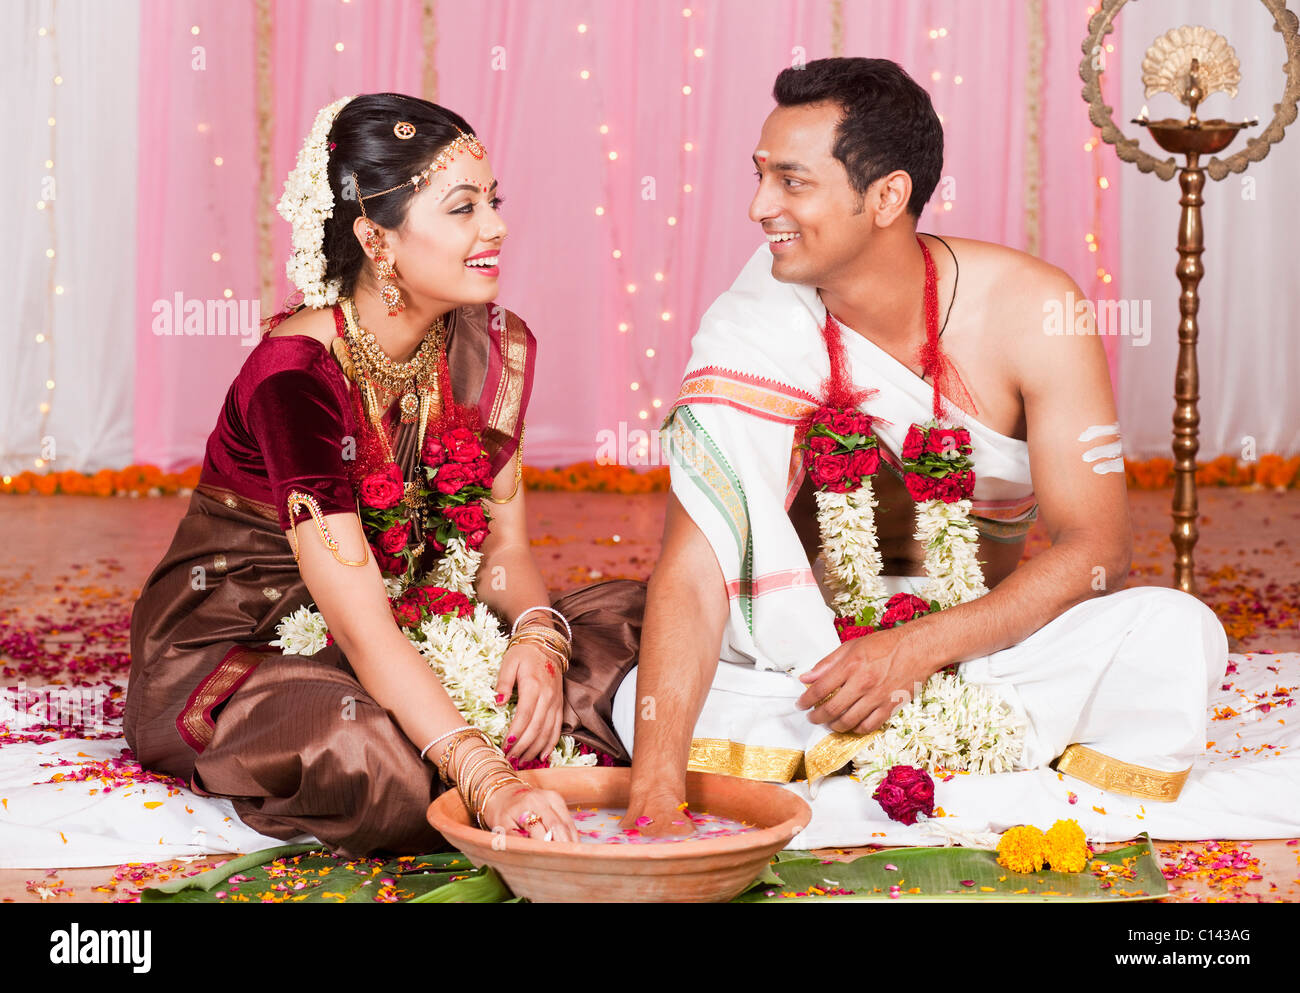 Couple Marriage Ceremony India Stock Photos & Couple Marriage ...